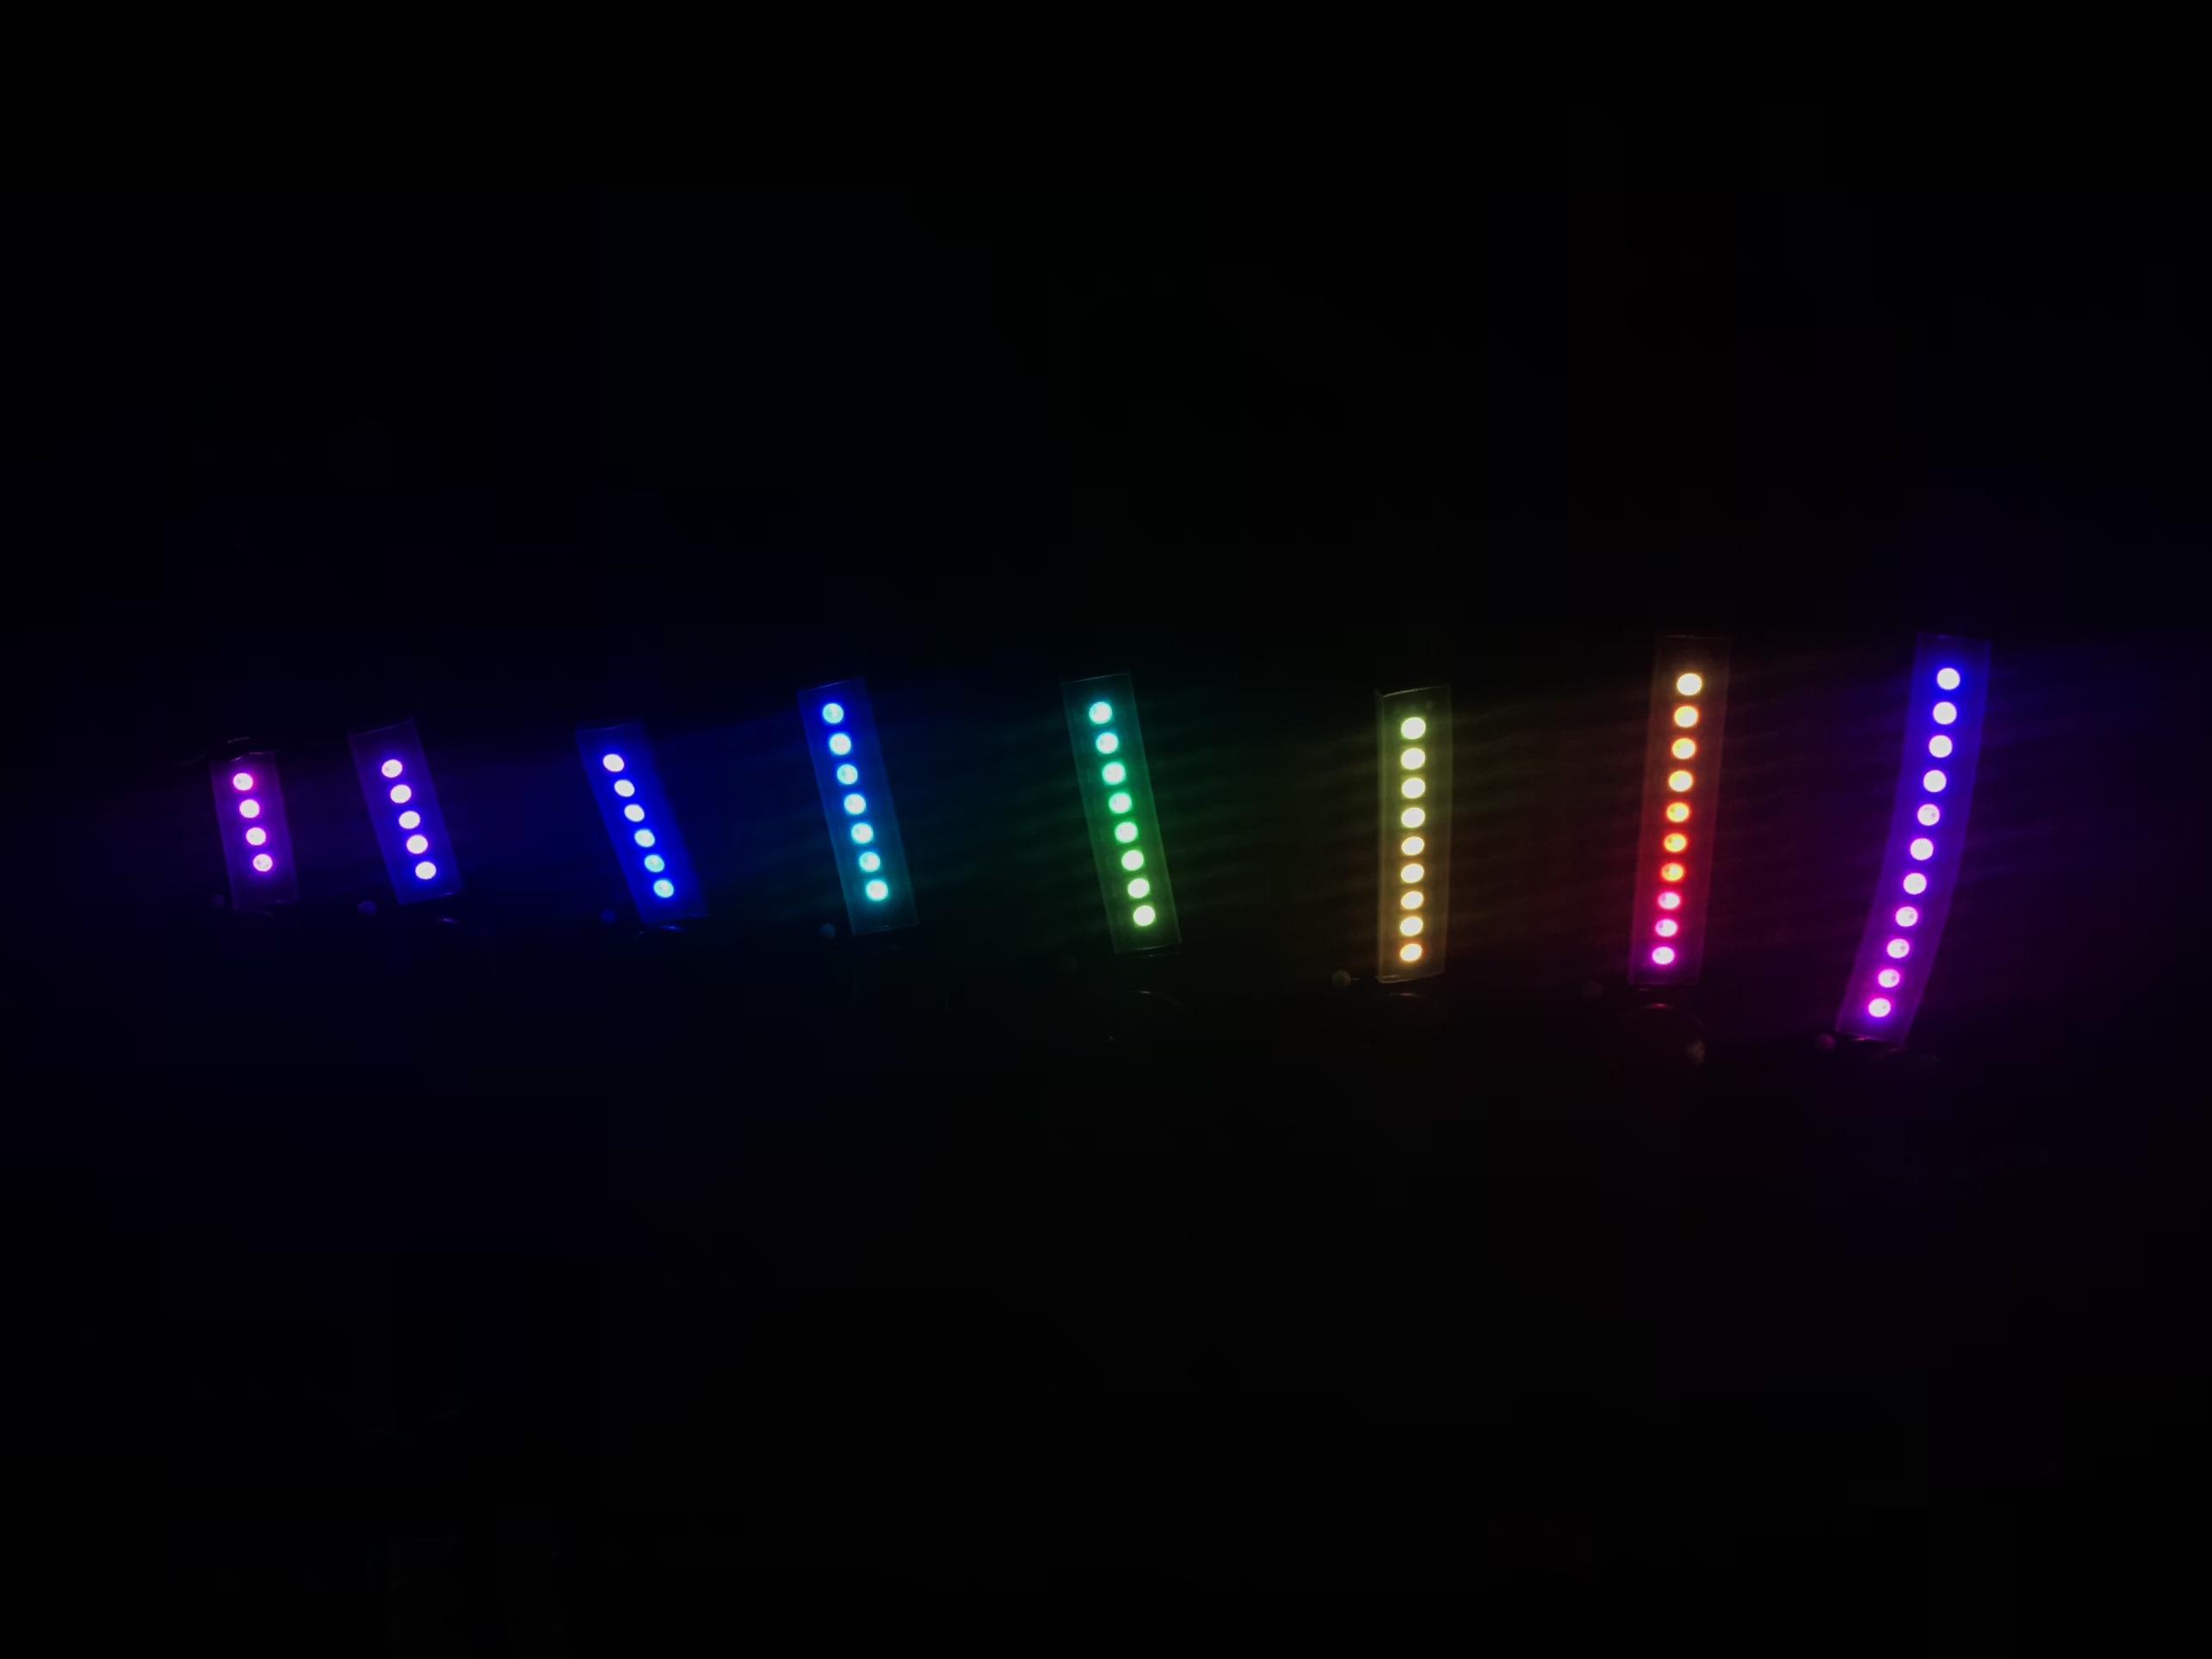 led_pixels_fullsizeoutput_2e37.jpeg